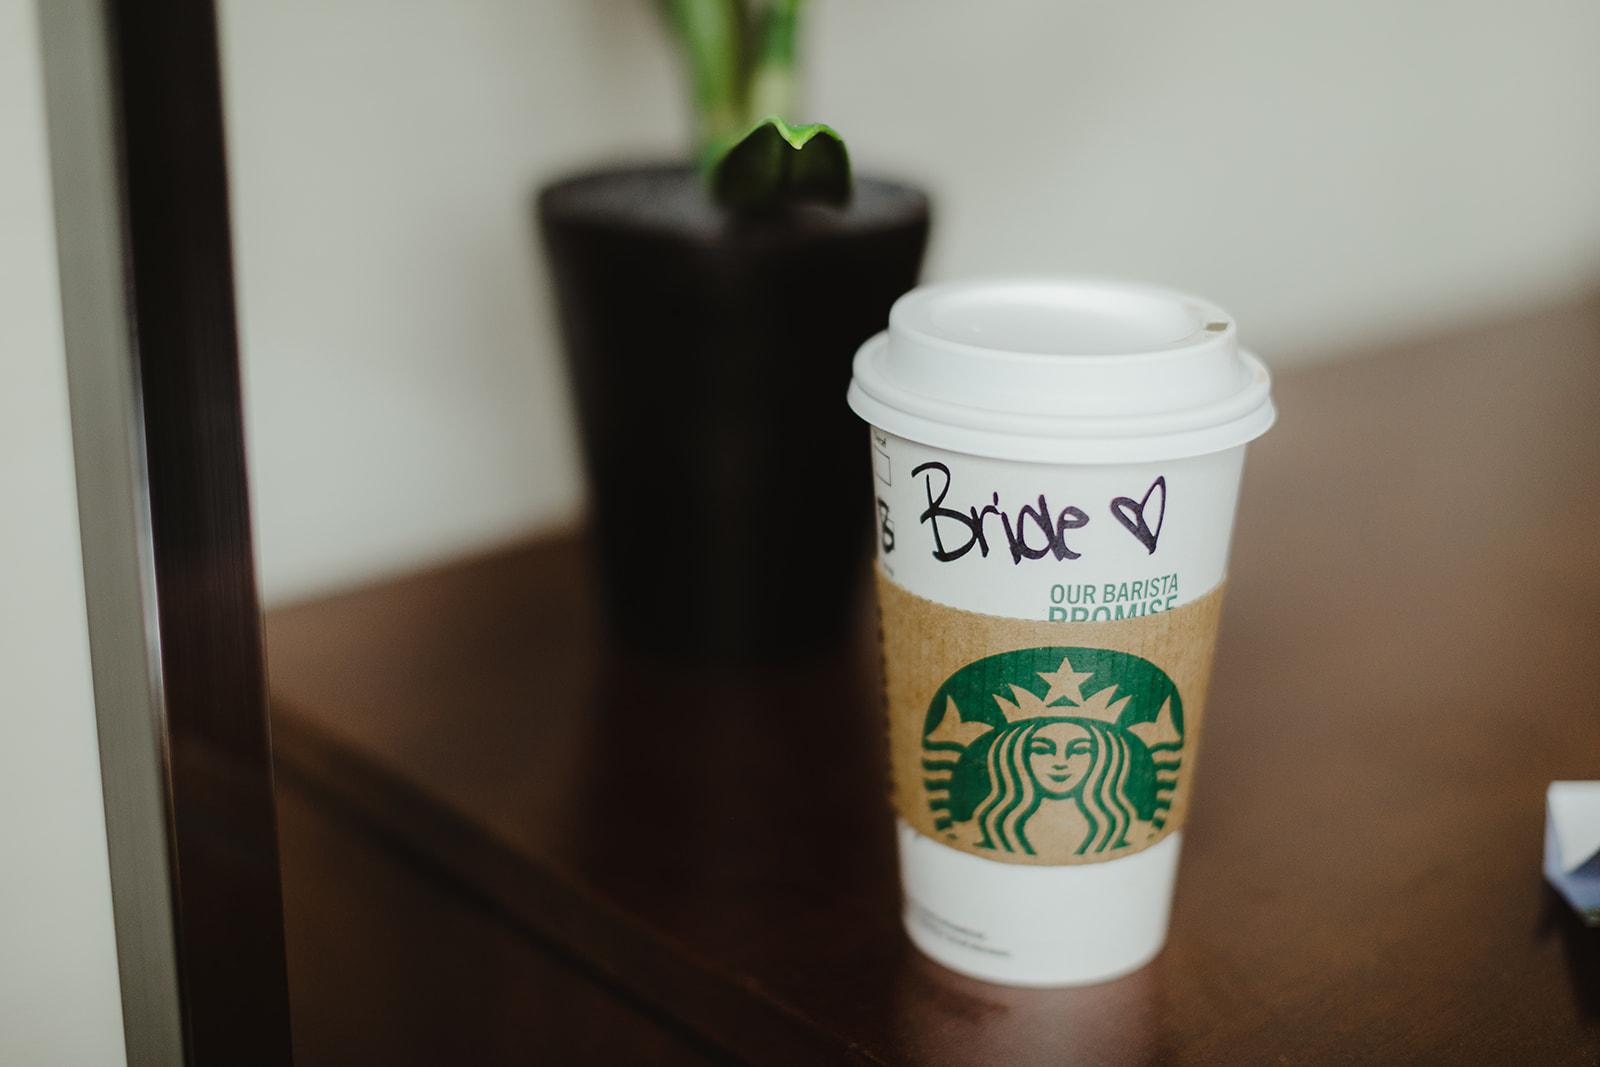 A starbucks Bride cup